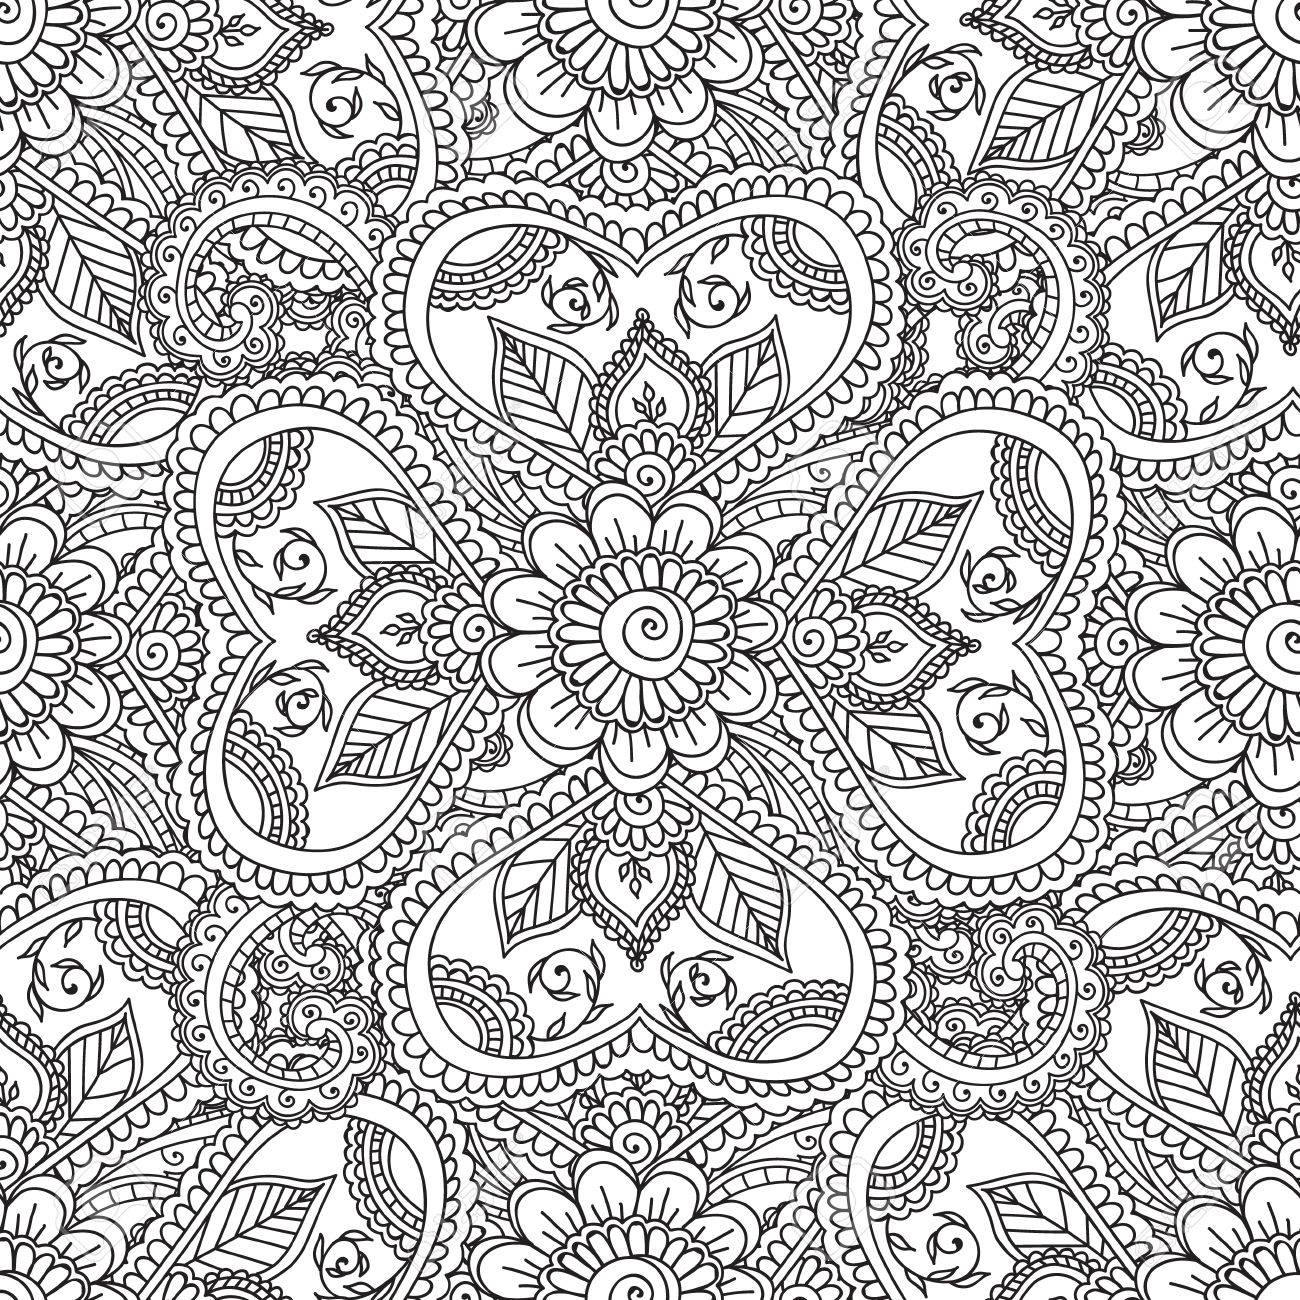 Colorear Páginas Para Adultos. Seanless Pattern.Henna Mehndi Doodles ...